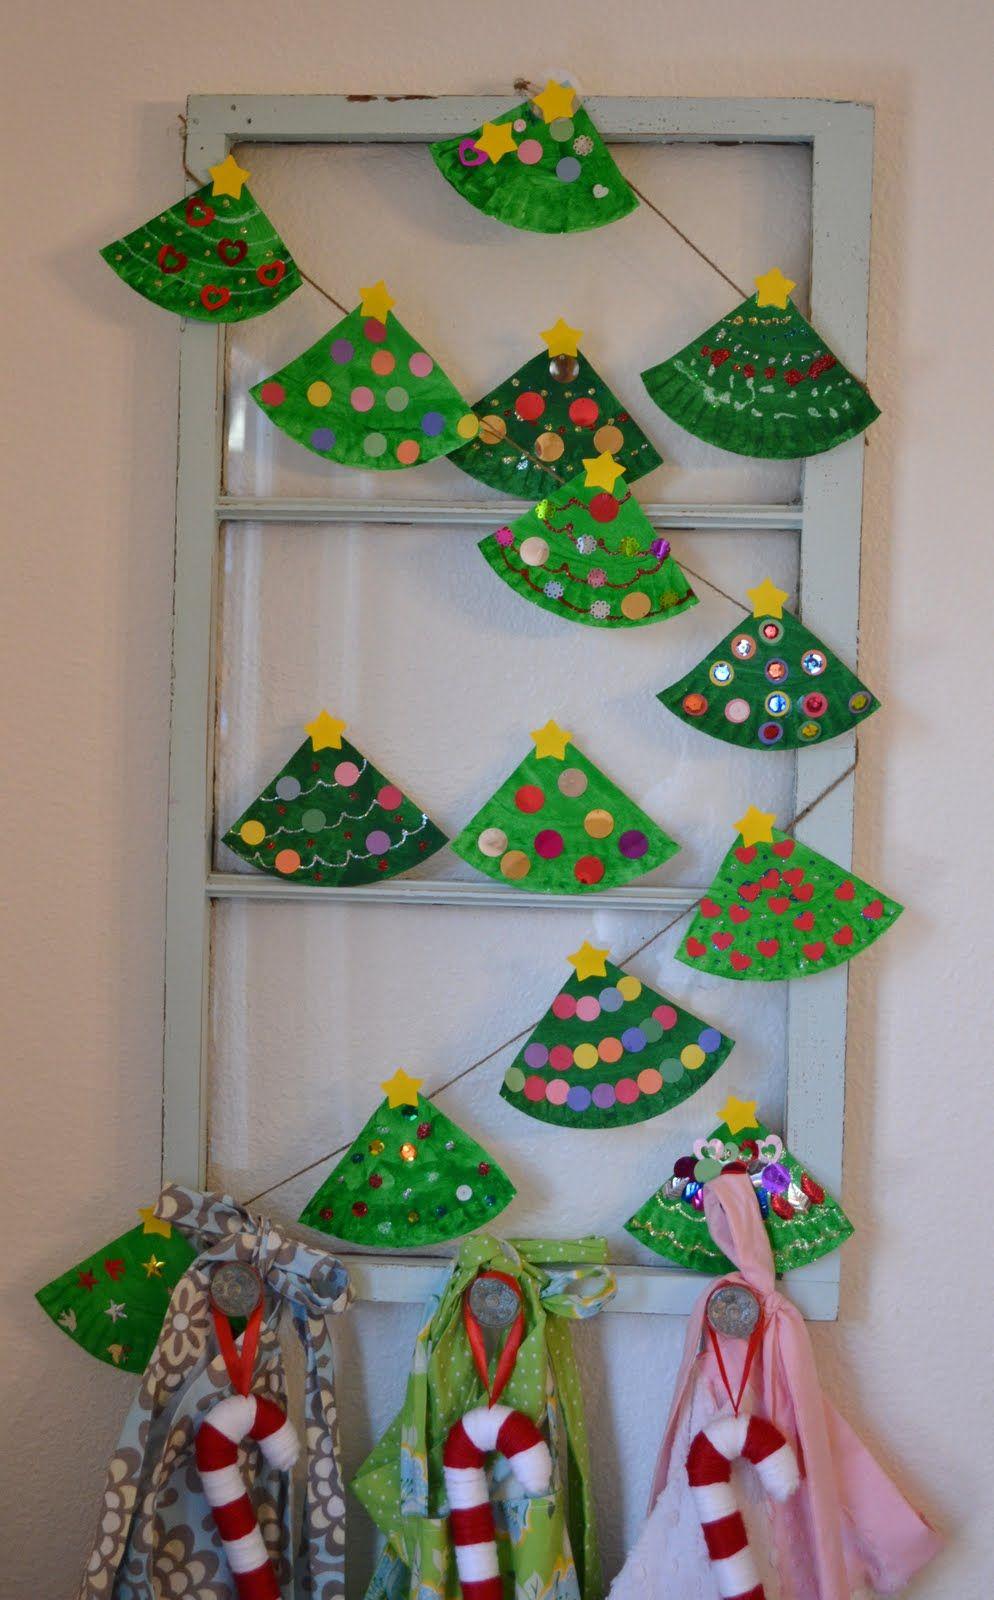 Pin by dolly ann criscoe on ornament kindergarten pinterest